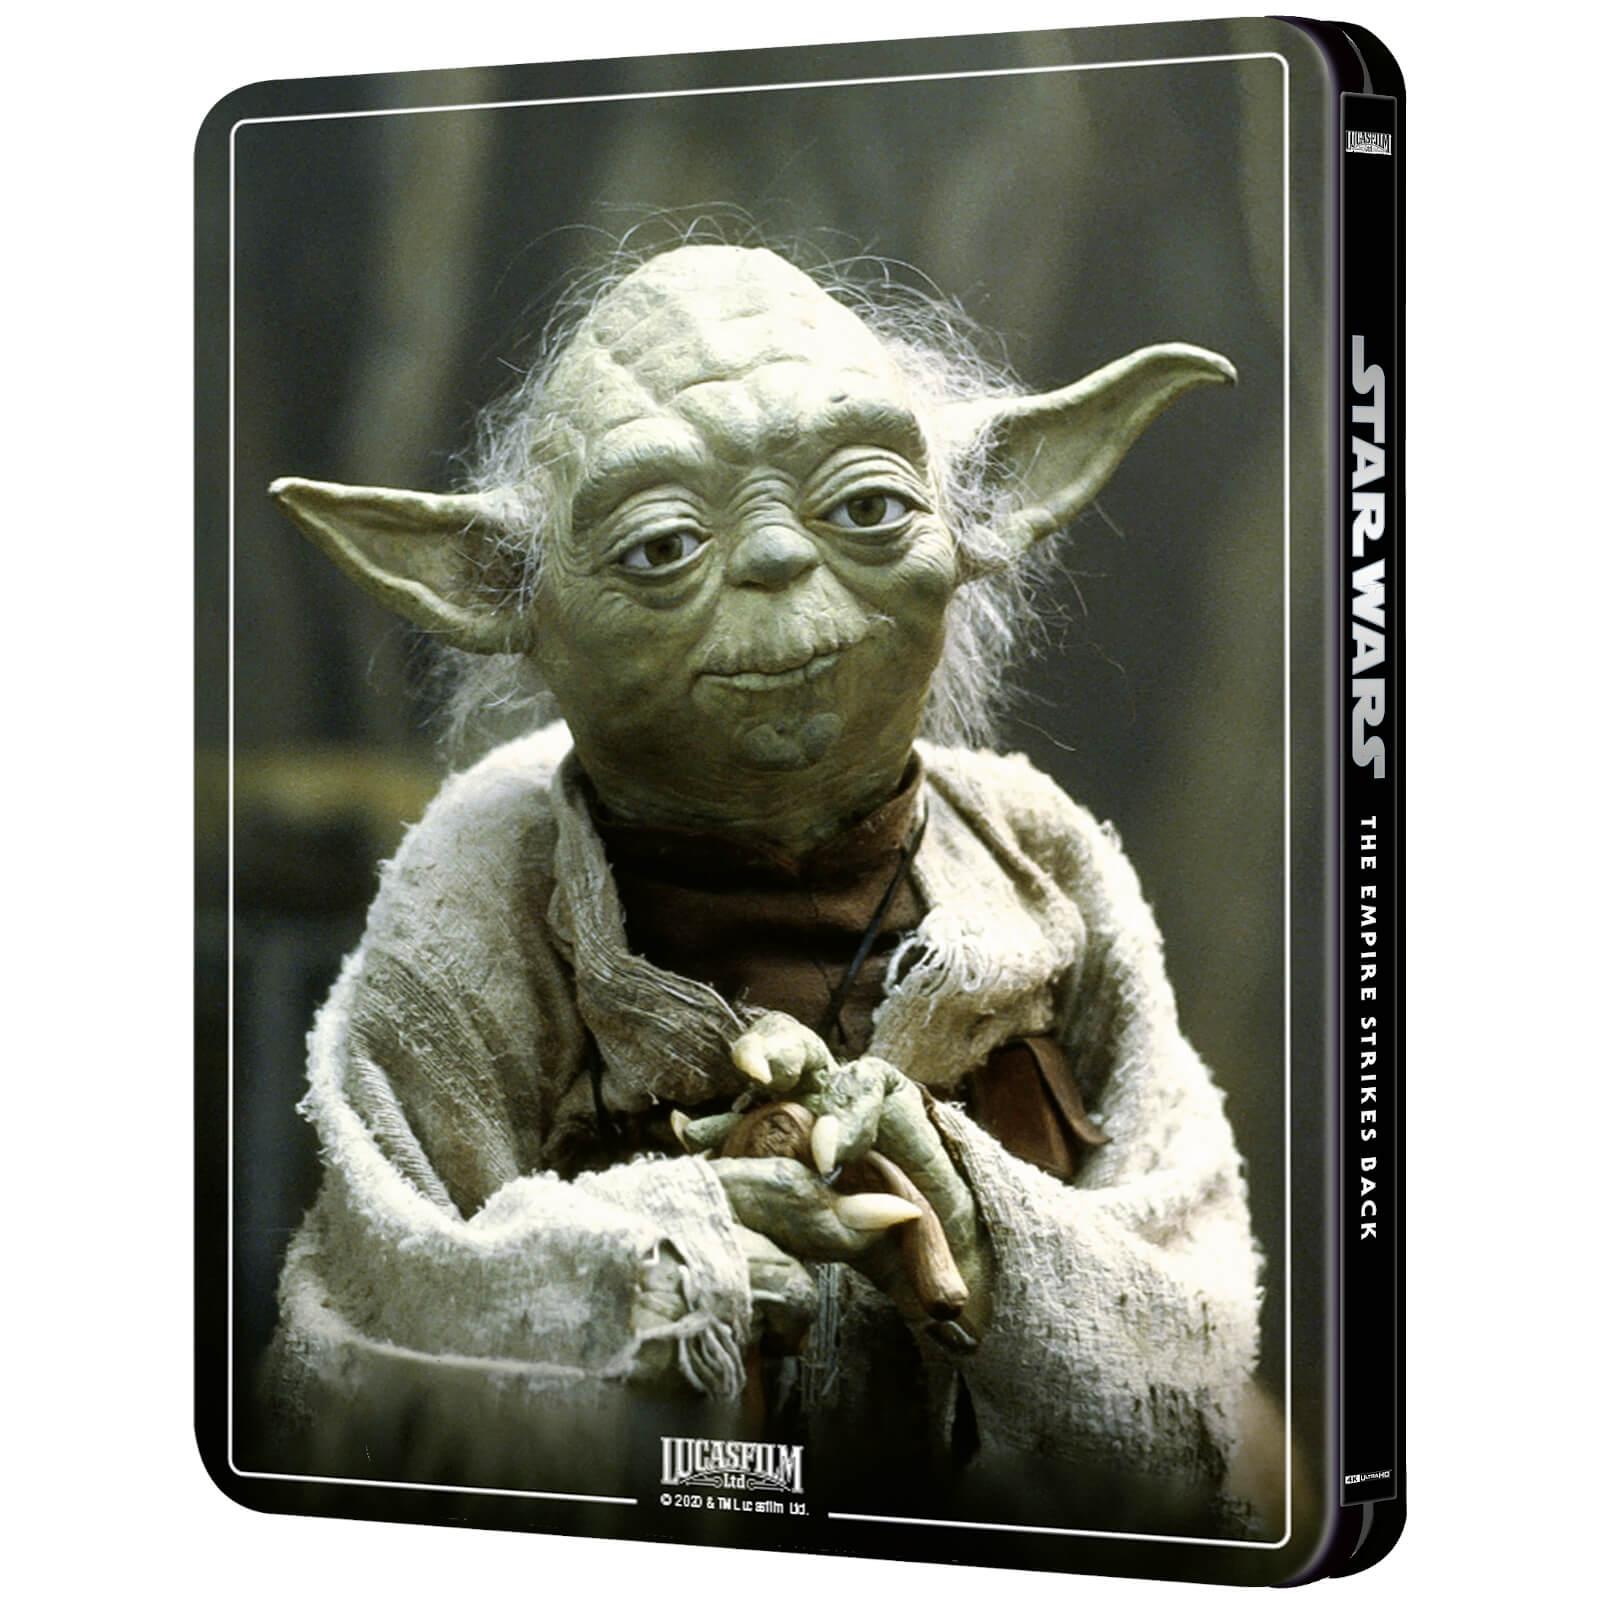 Star Wars: Episode V - The Empire Strikes Back (4K+2D Blu-ray SteelBook) Zavvi Star-Wars-The-Empire-Strike-Back-steelbook-4K-zavvi-2